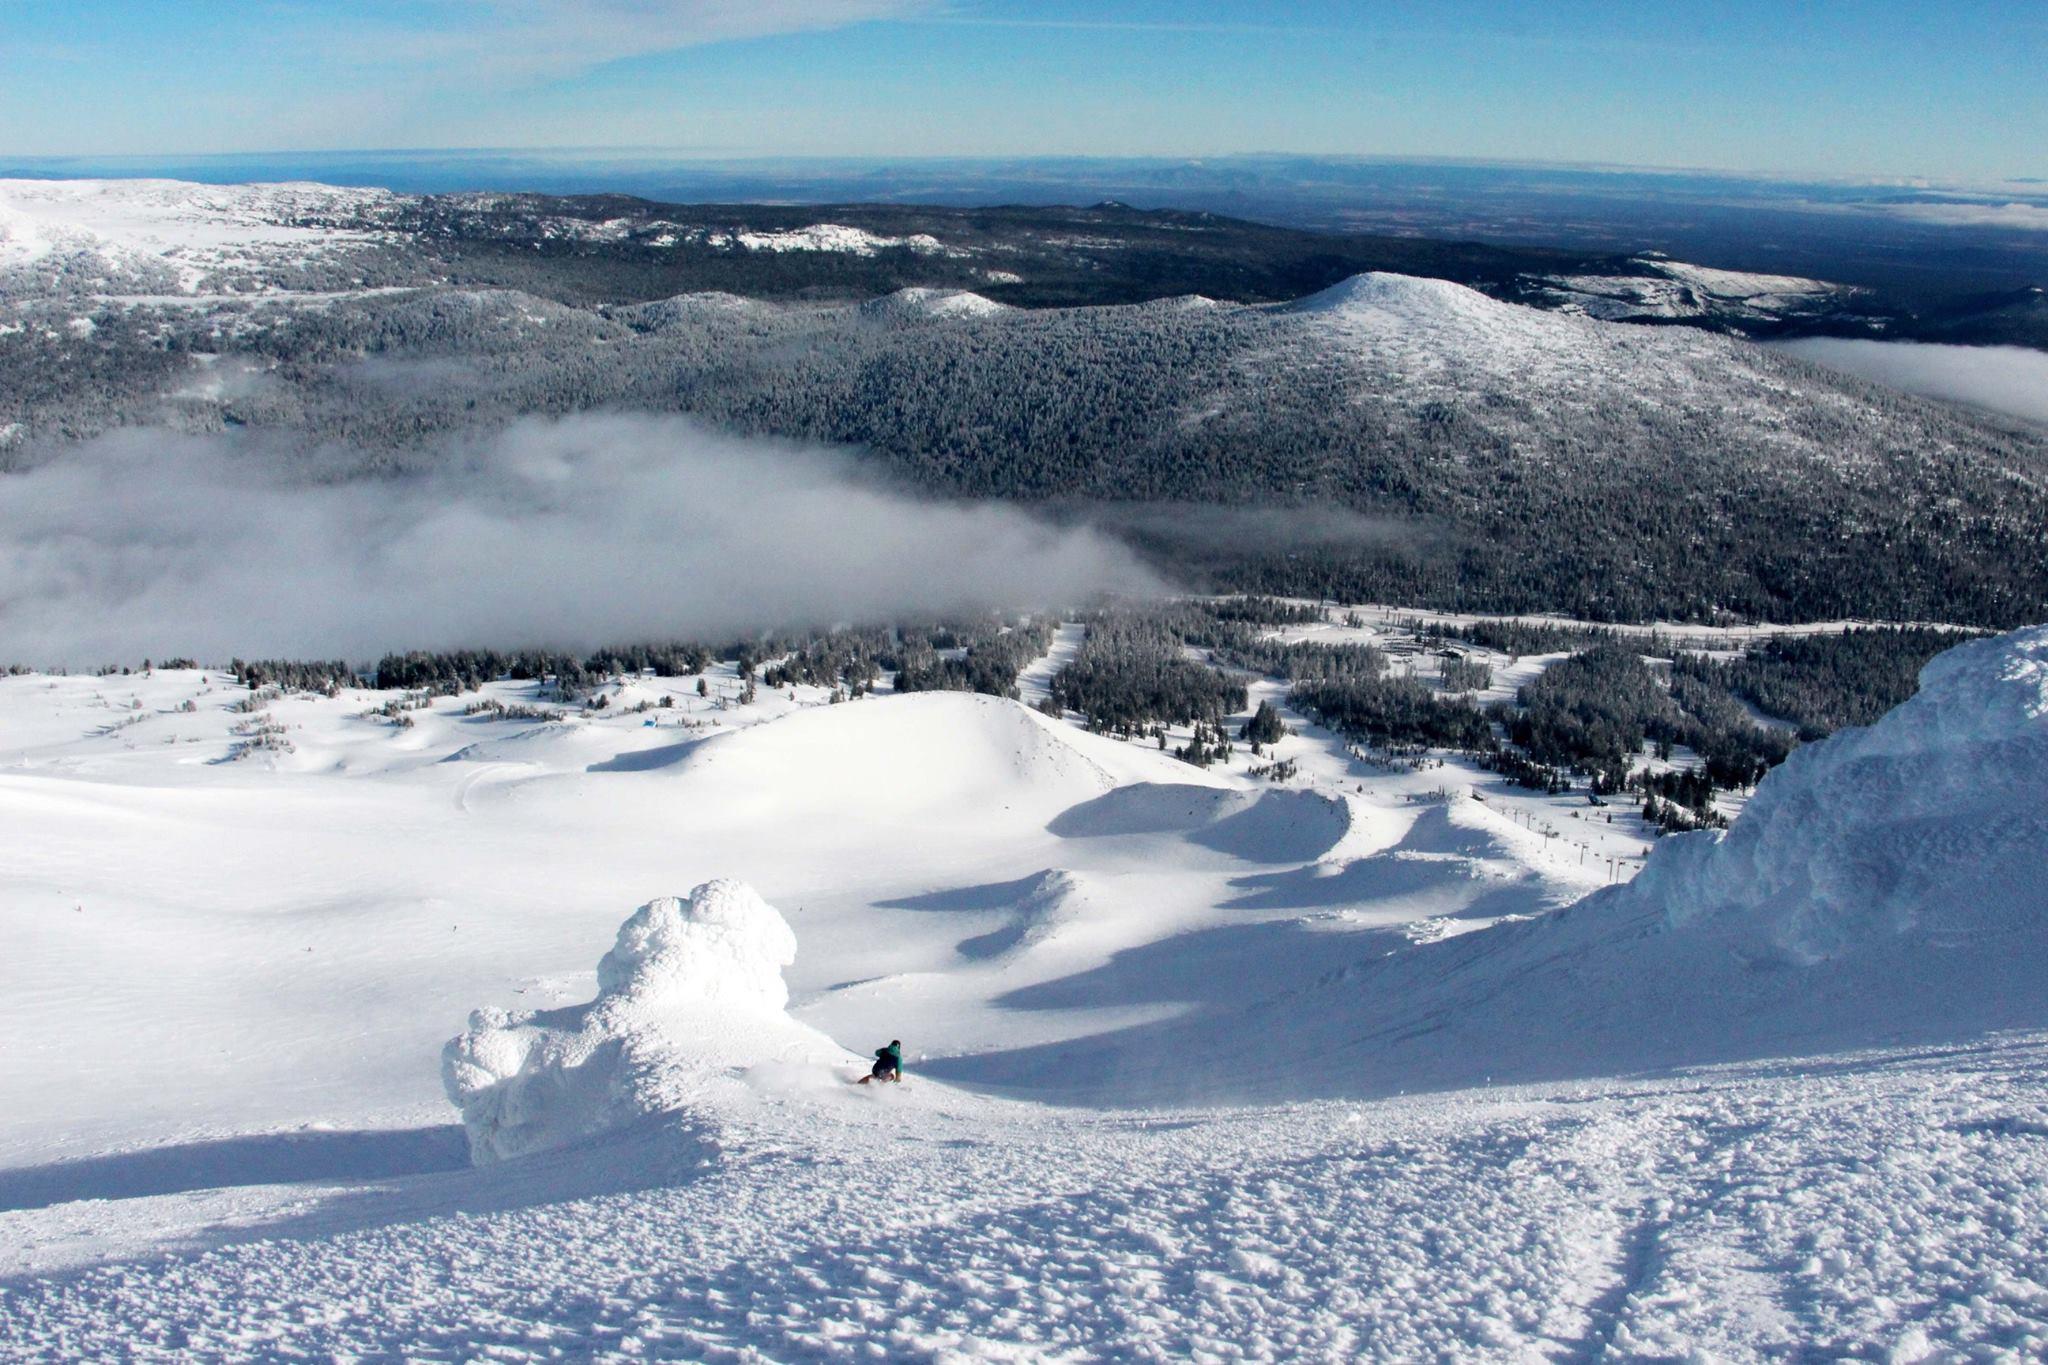 Mt. Bachelor, OR's moonscape volcanic skiing on Jan. 25th, 2016. photo: bachelor